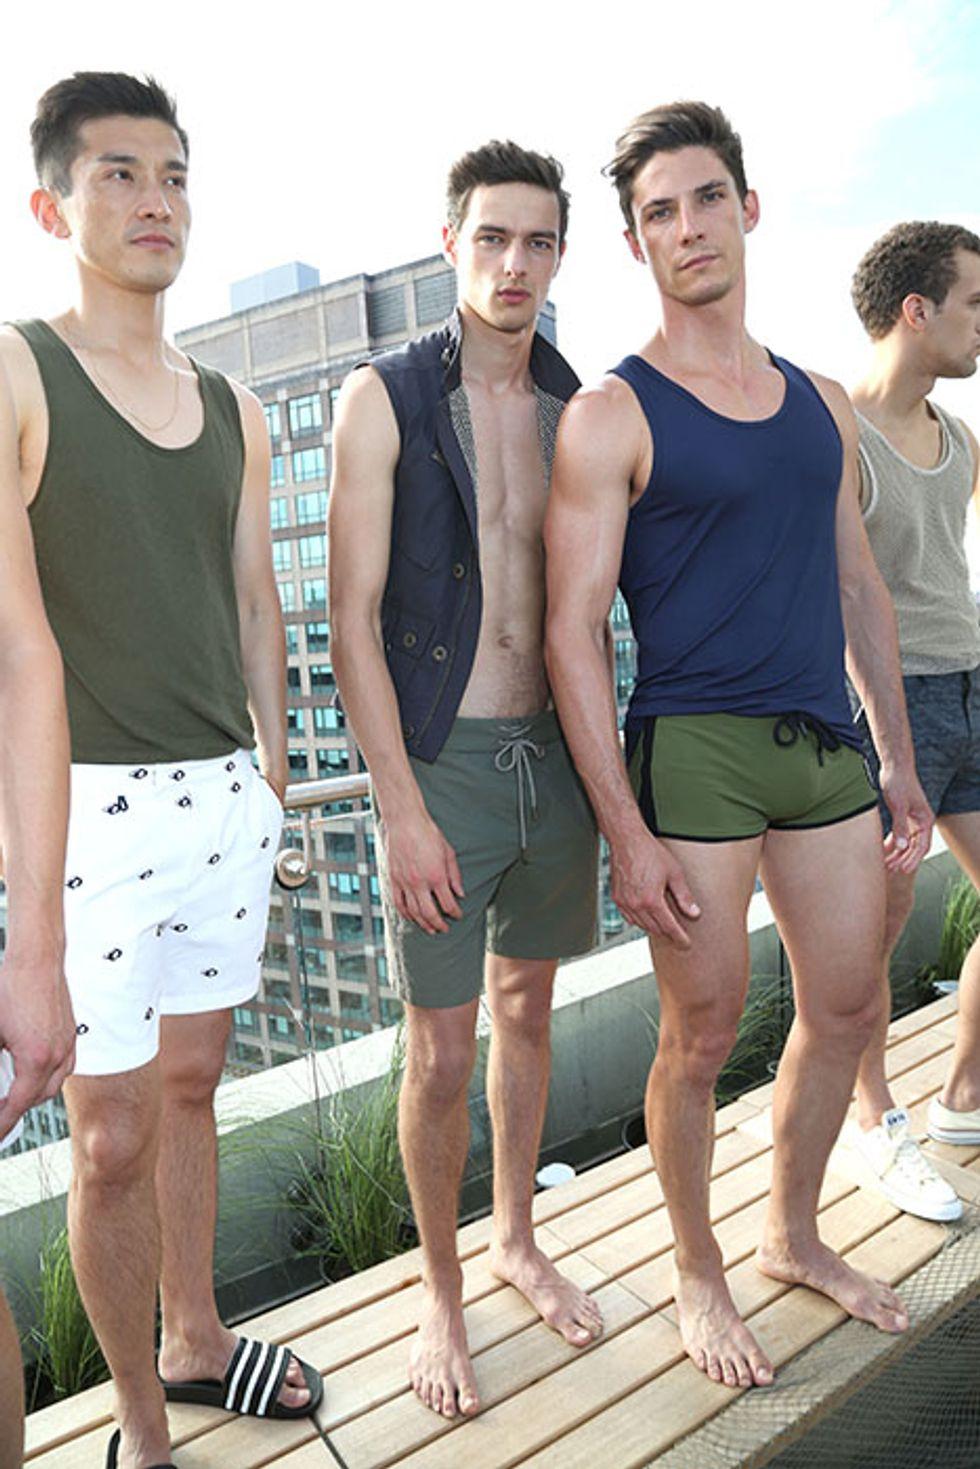 Model Crush Monday: Garrett Neff